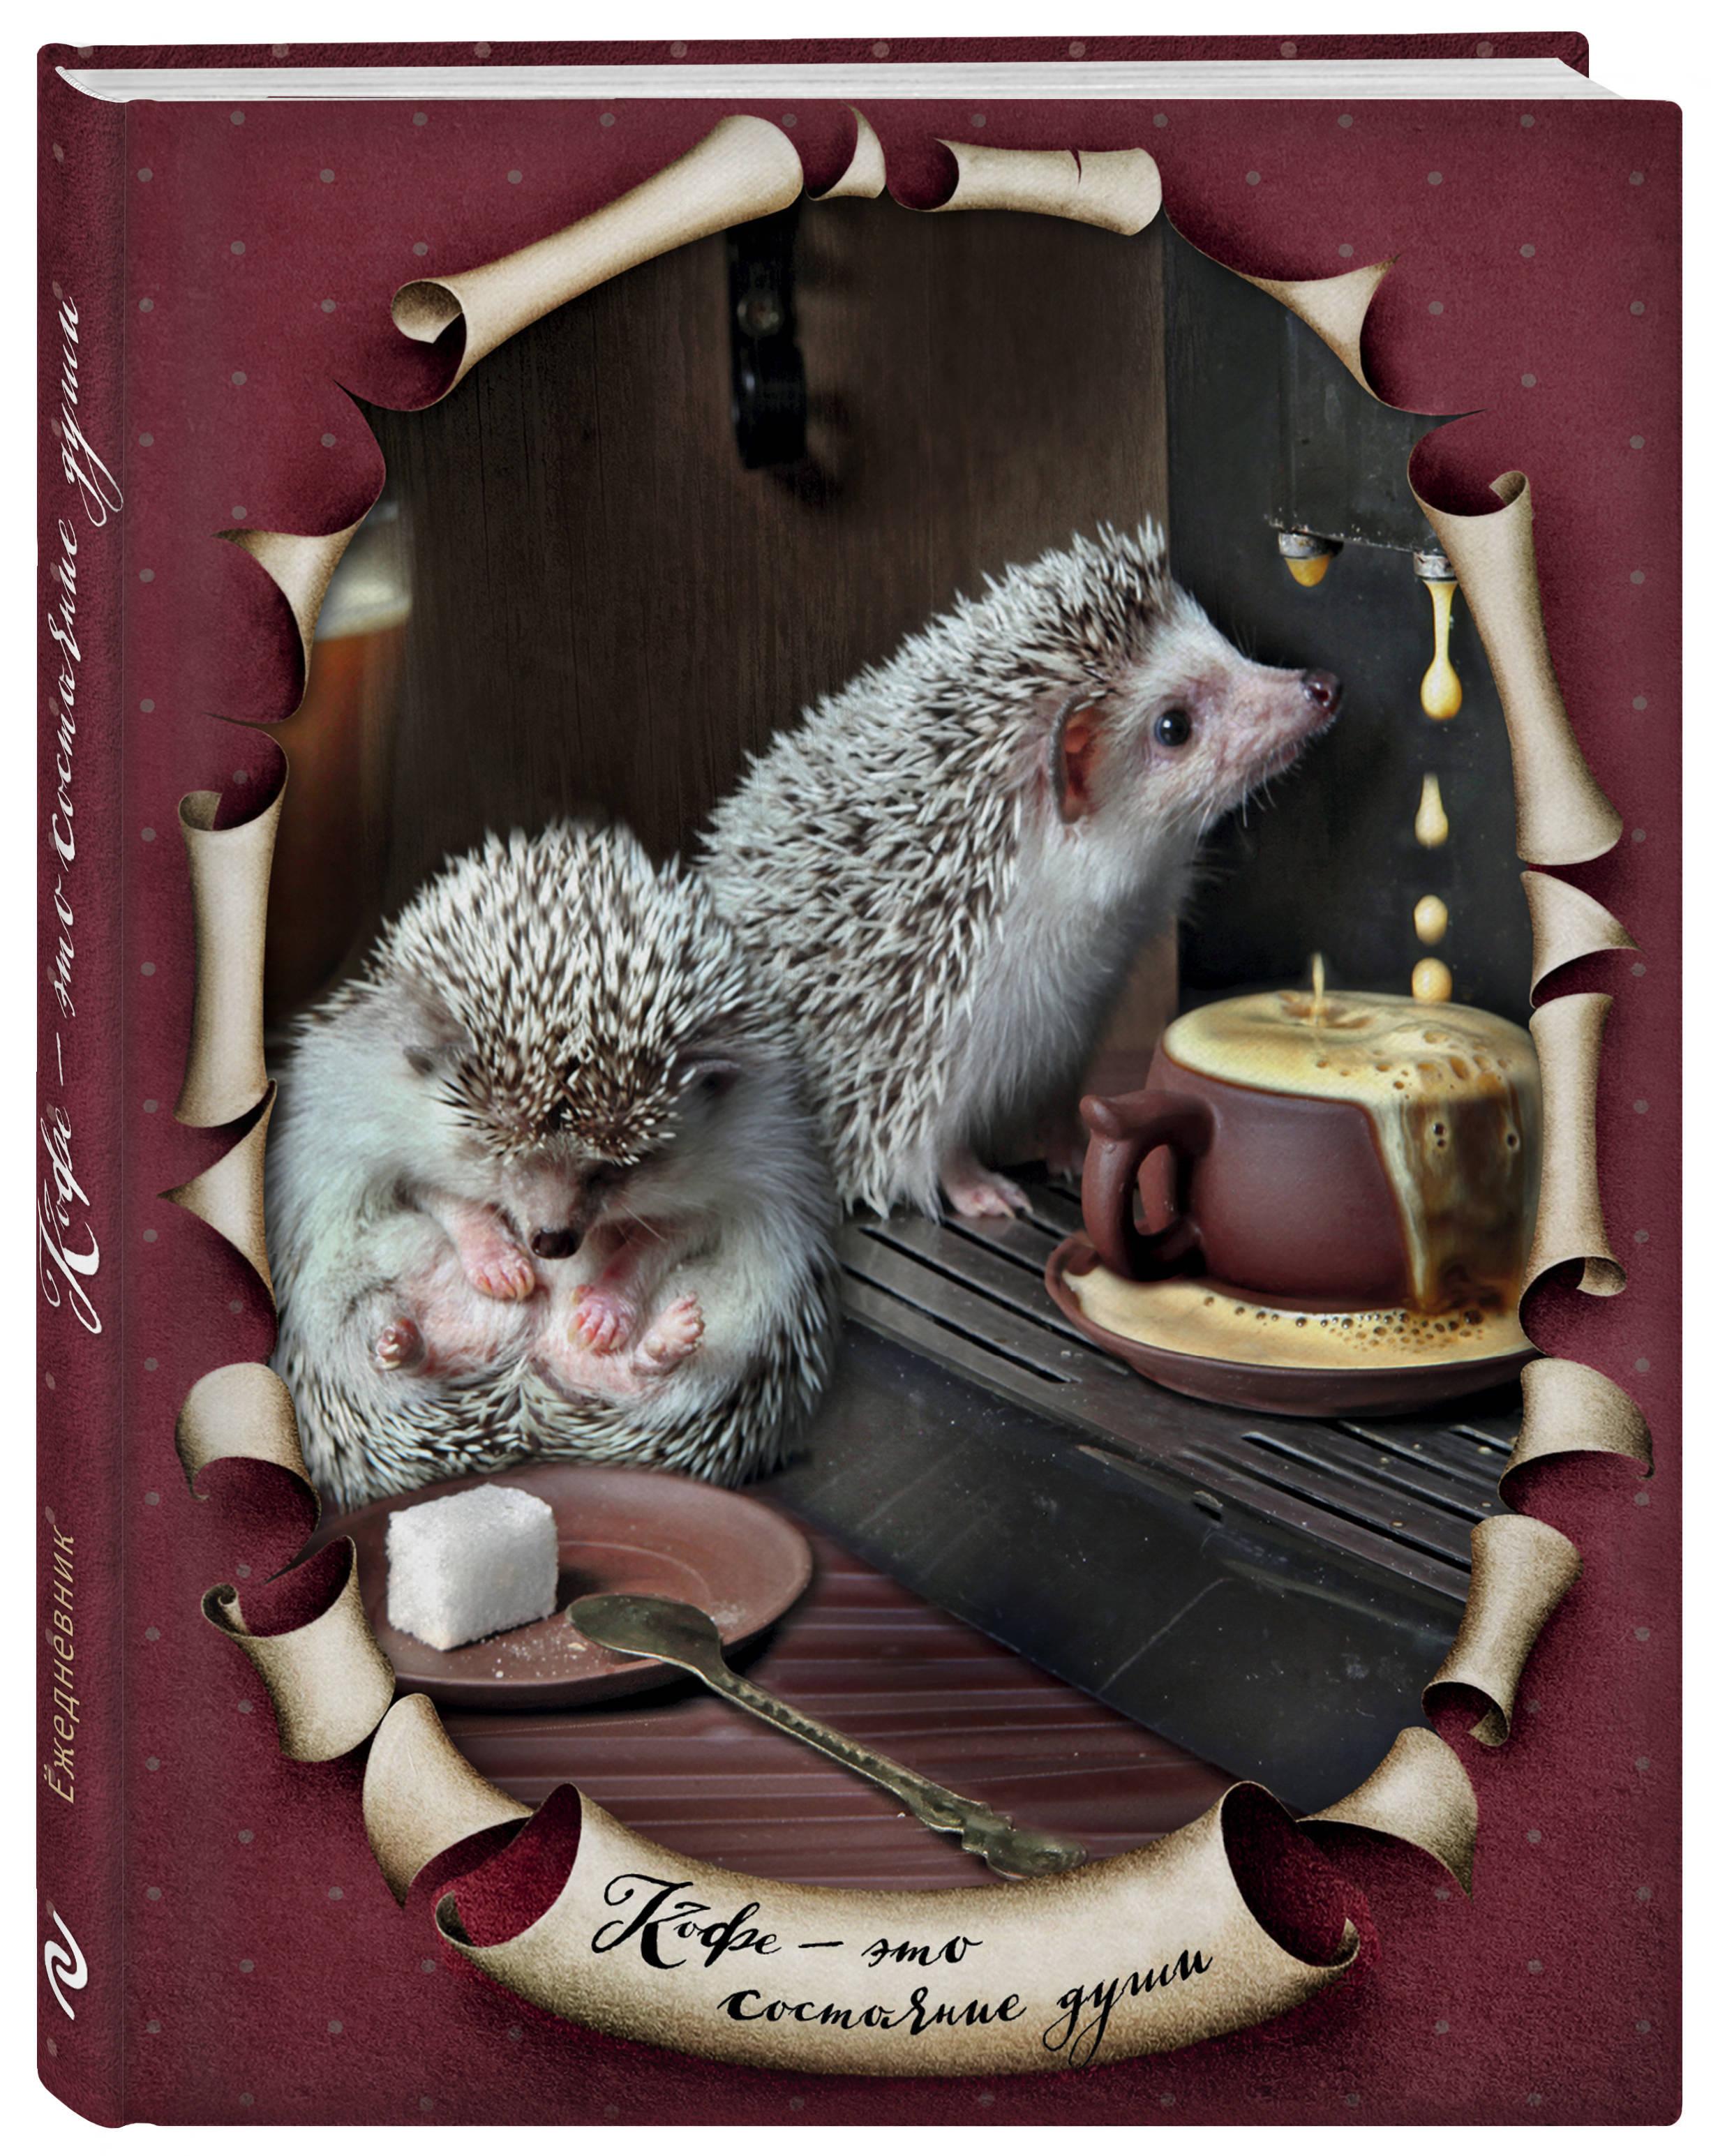 Еремина Е.П. Блокнот с ежиками: Ёжедневник Кофе - это состояние души кофе это состояние души блокнот для людей и ежей а5